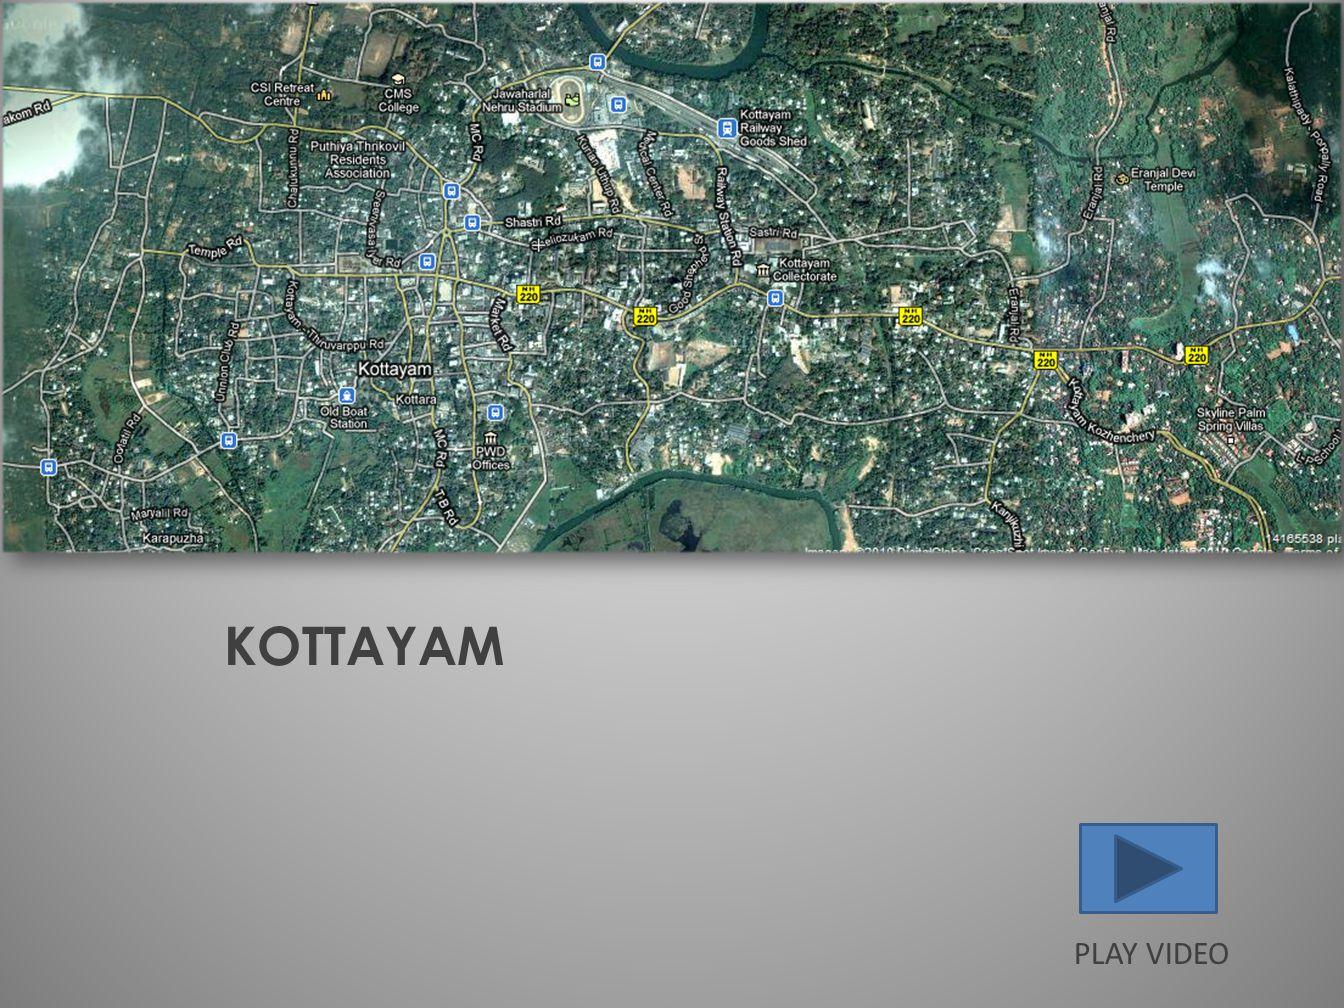 PLAY VIDEO KOTTAYAM